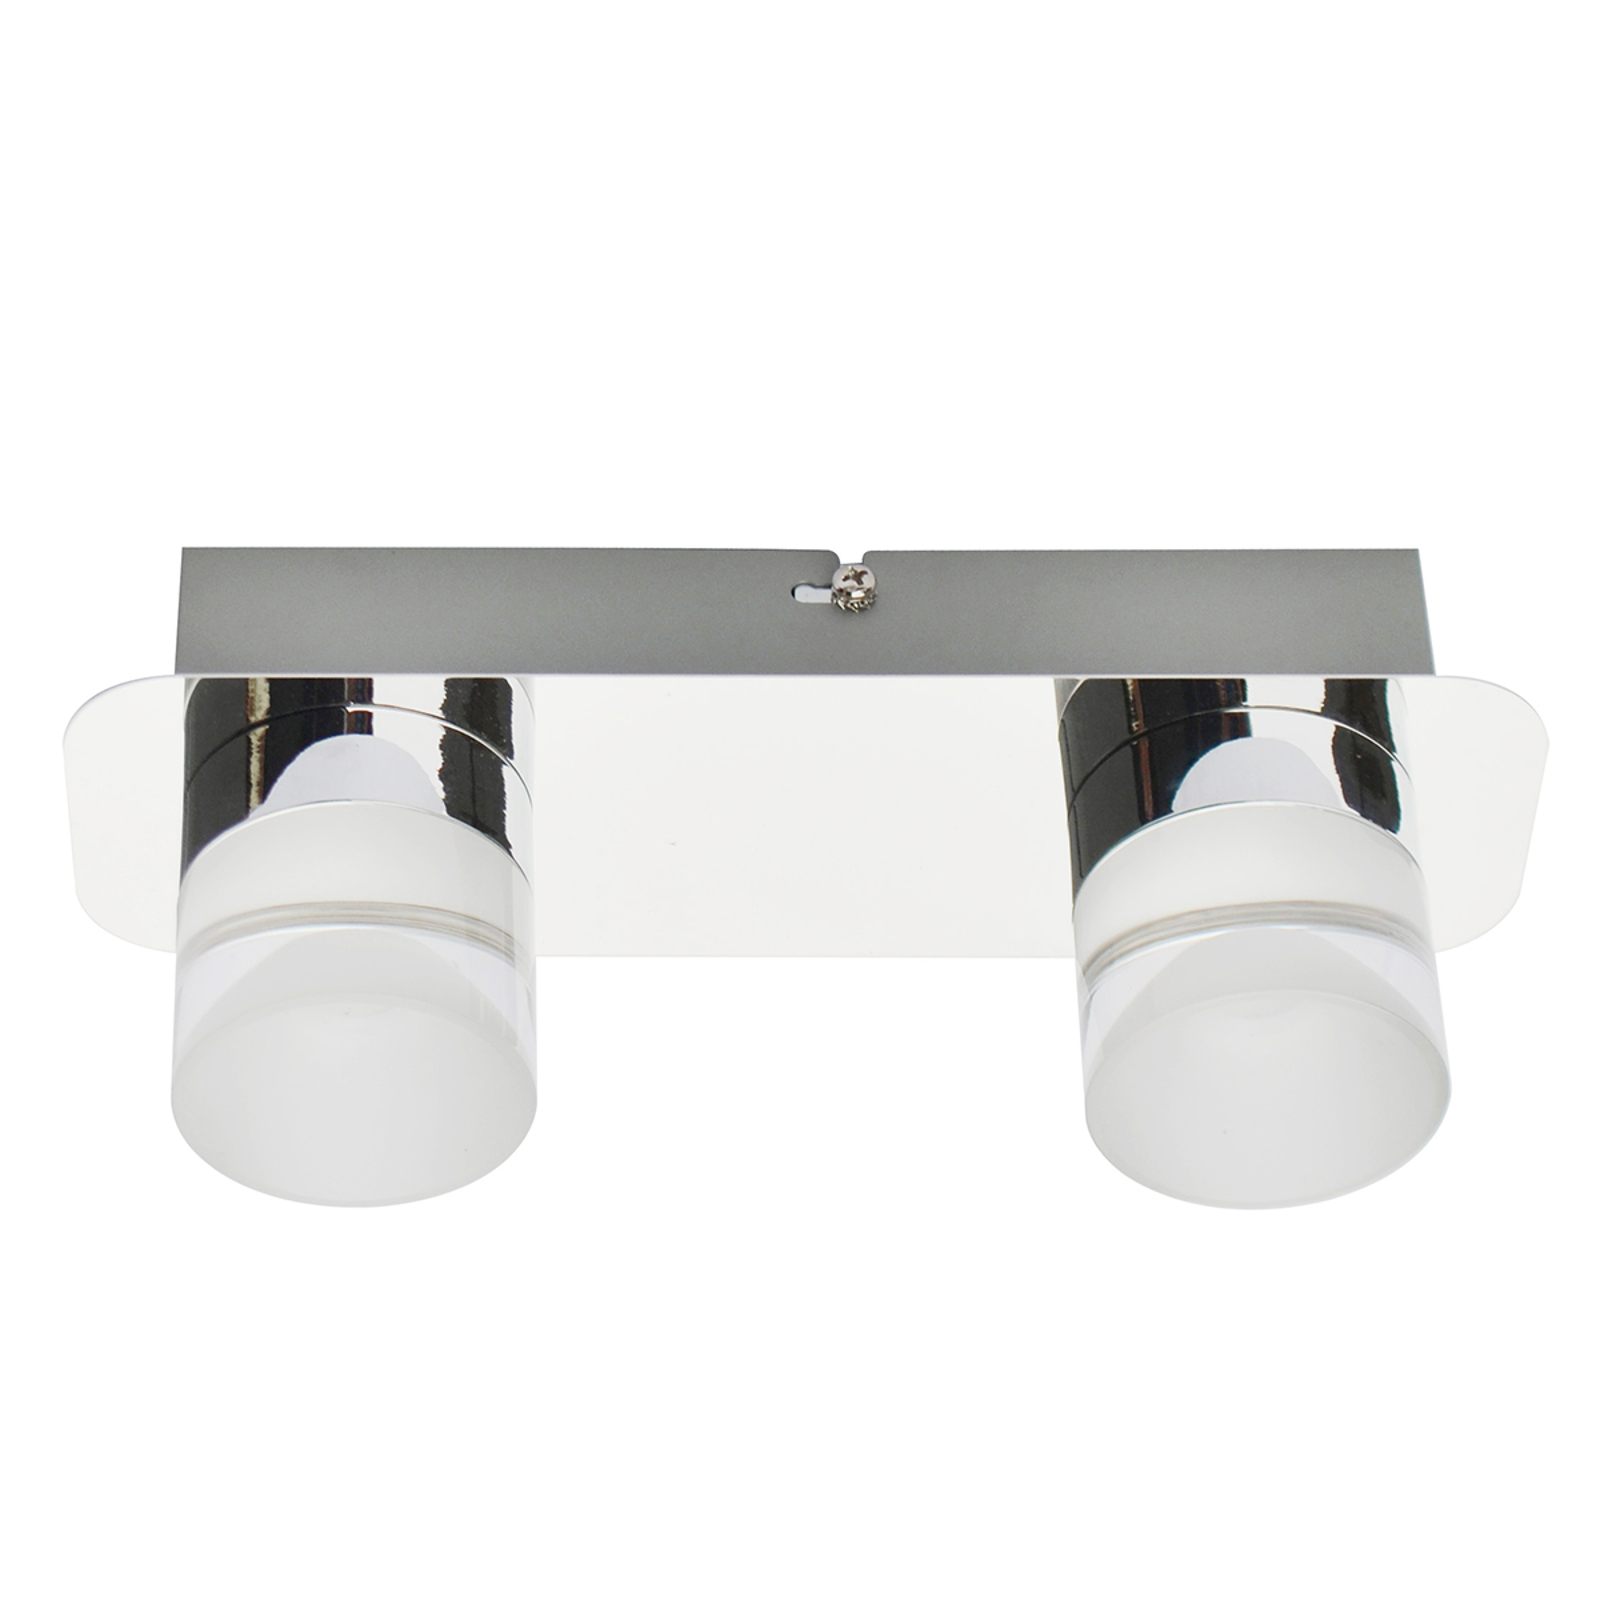 Stefanie - plafoniera a 2 luci dal design moderno